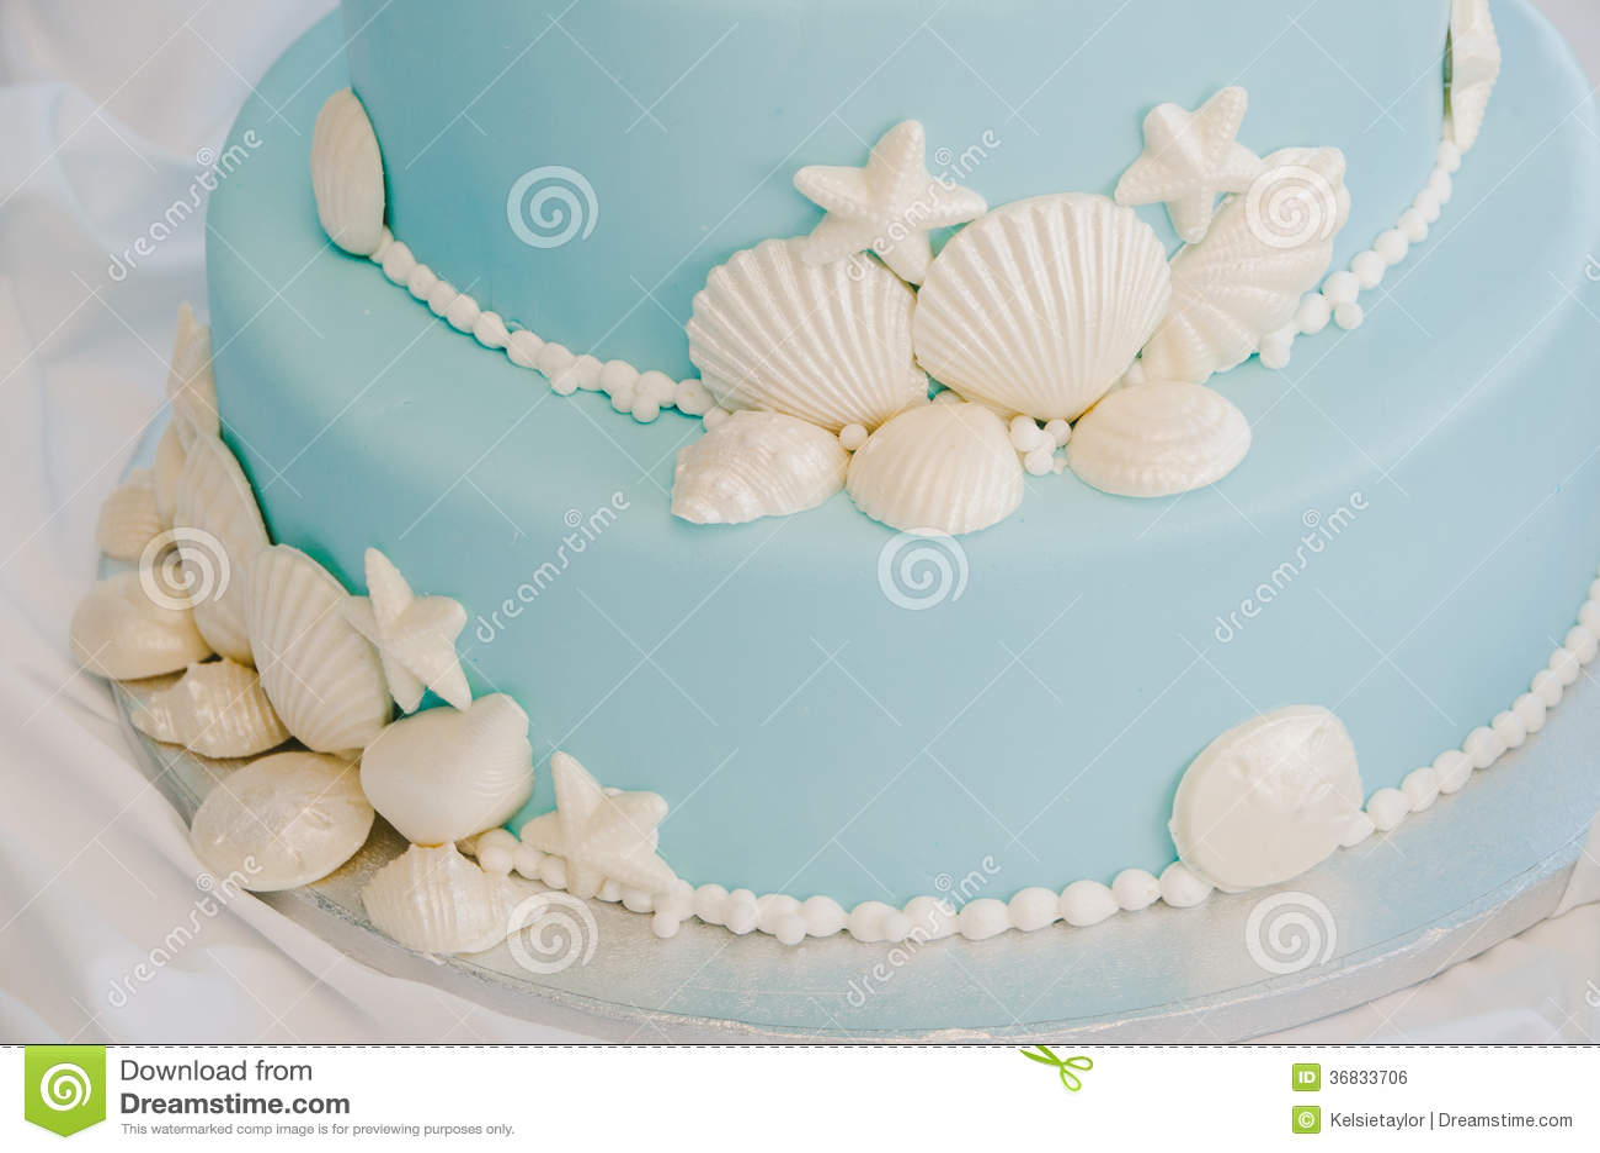 Bunting On Wedding Cakes